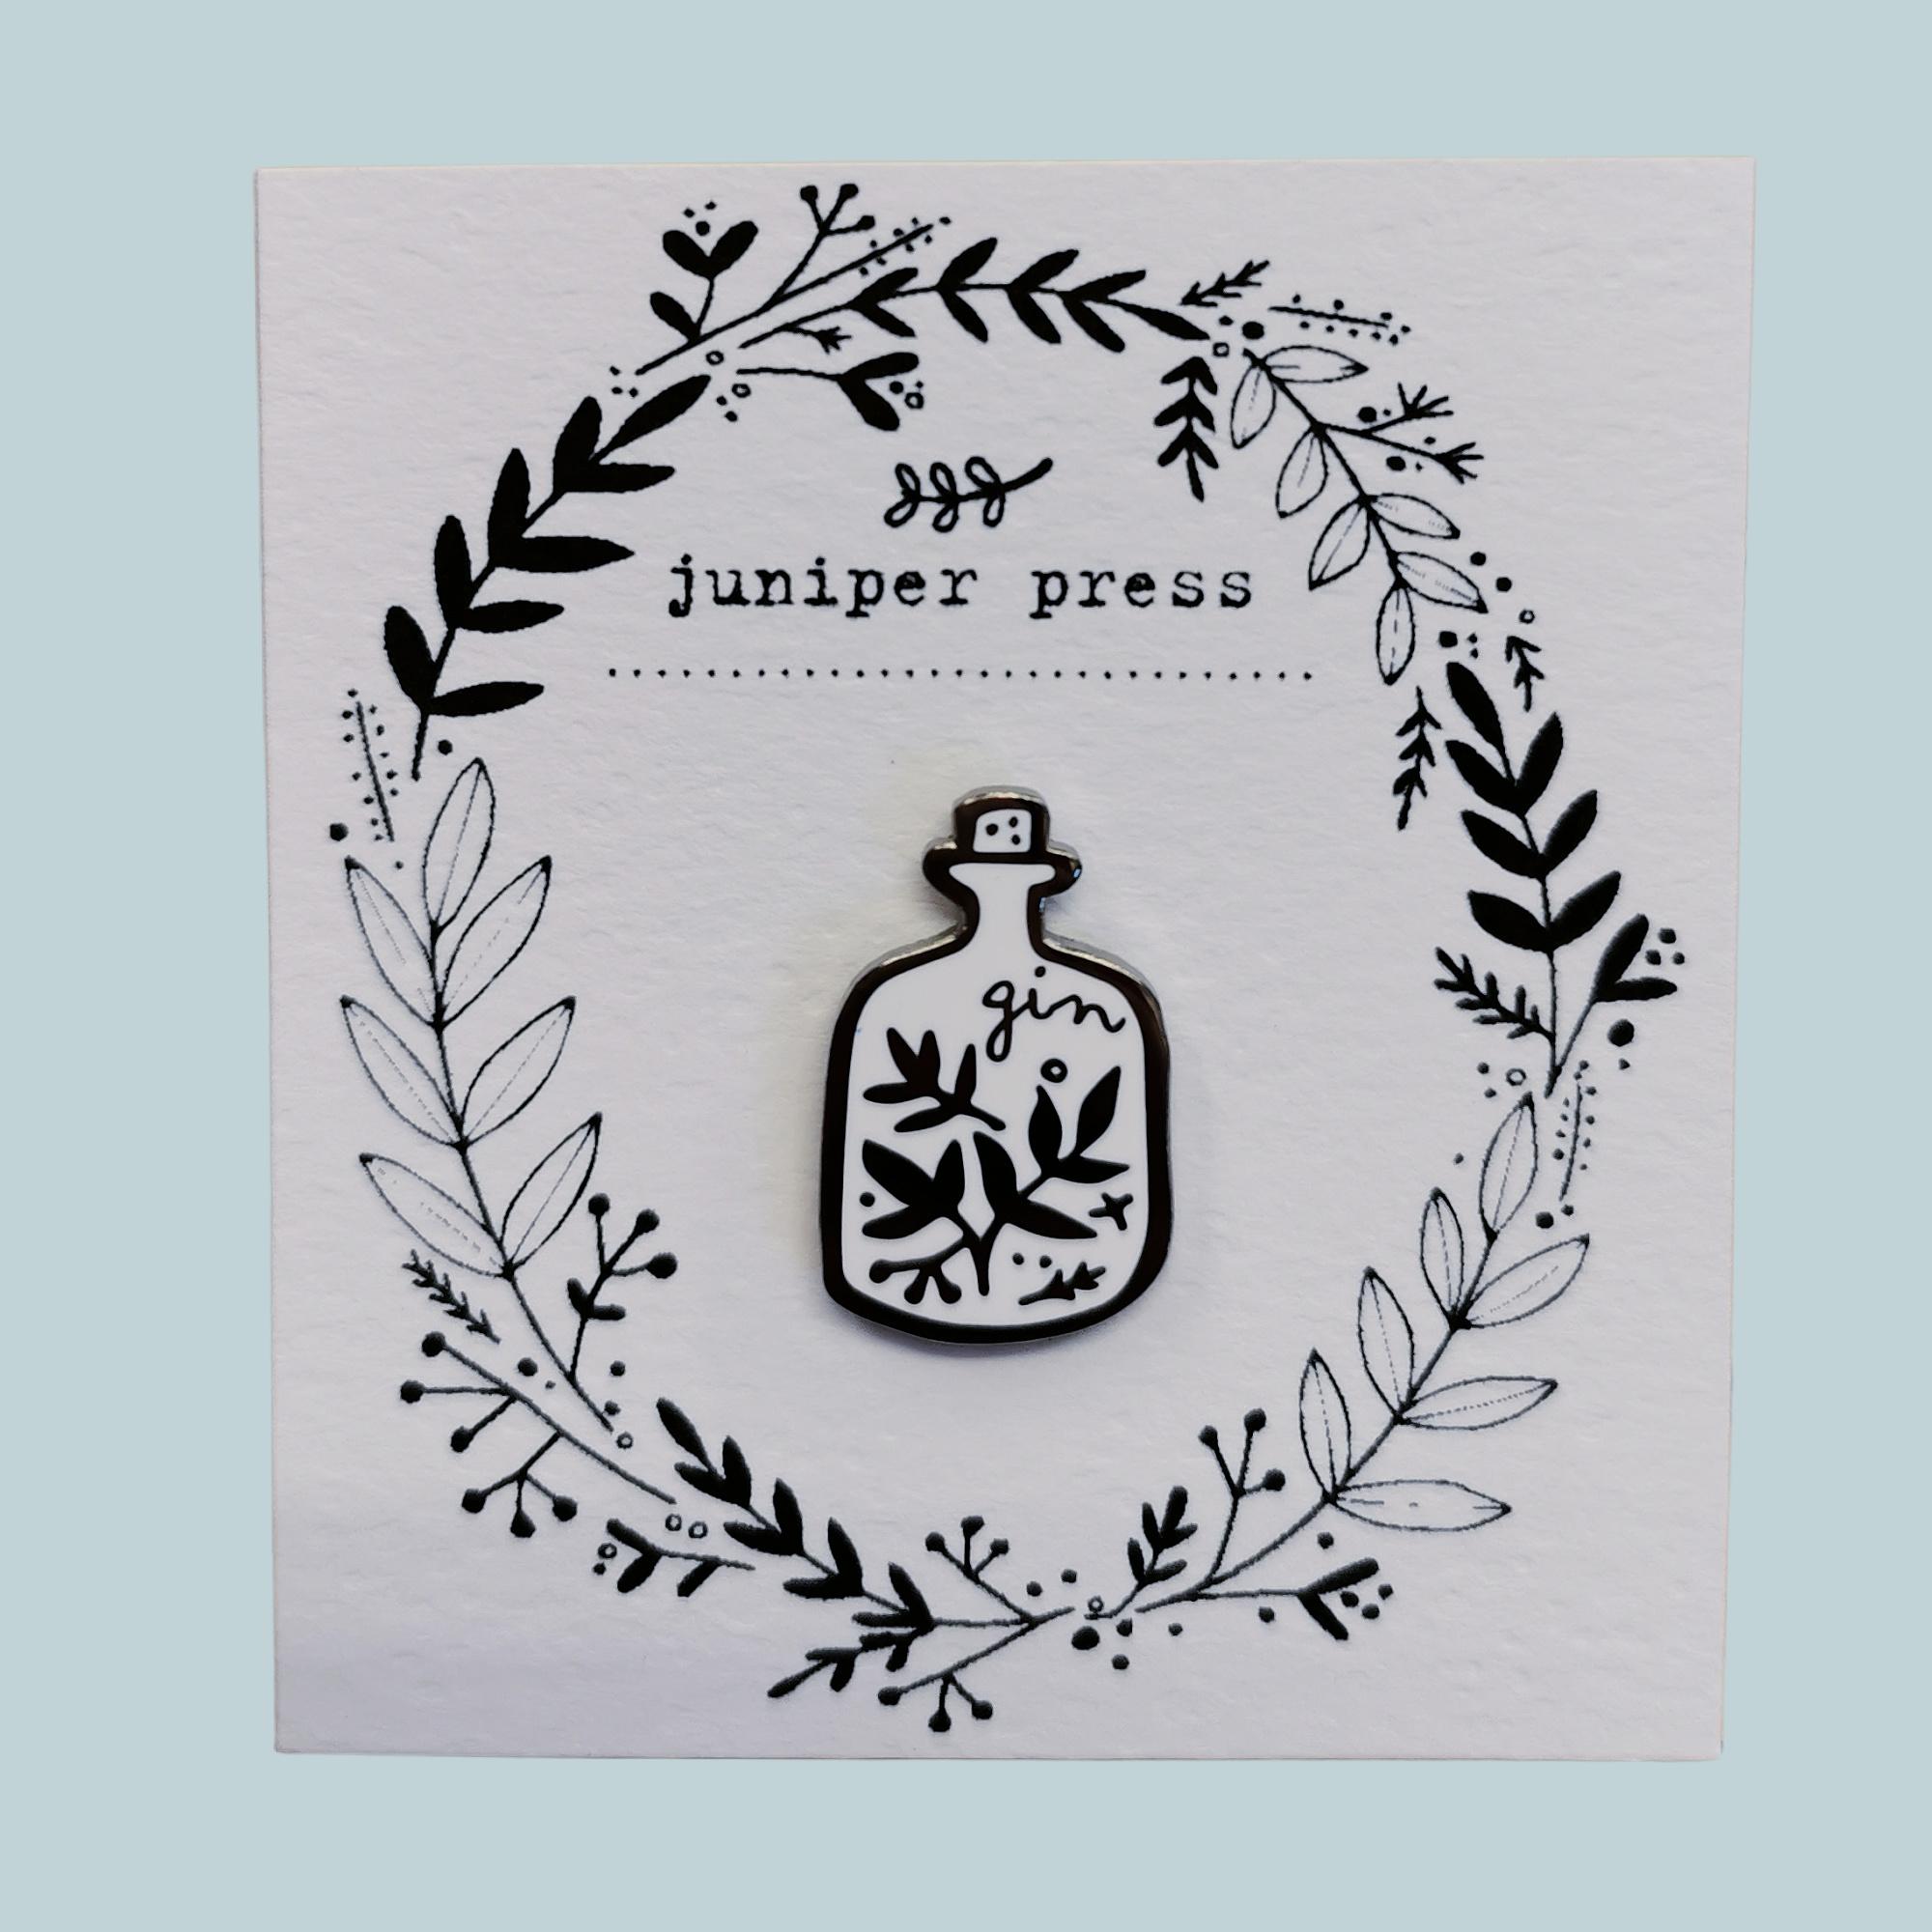 Gin Enamel Pin by Juniper Press